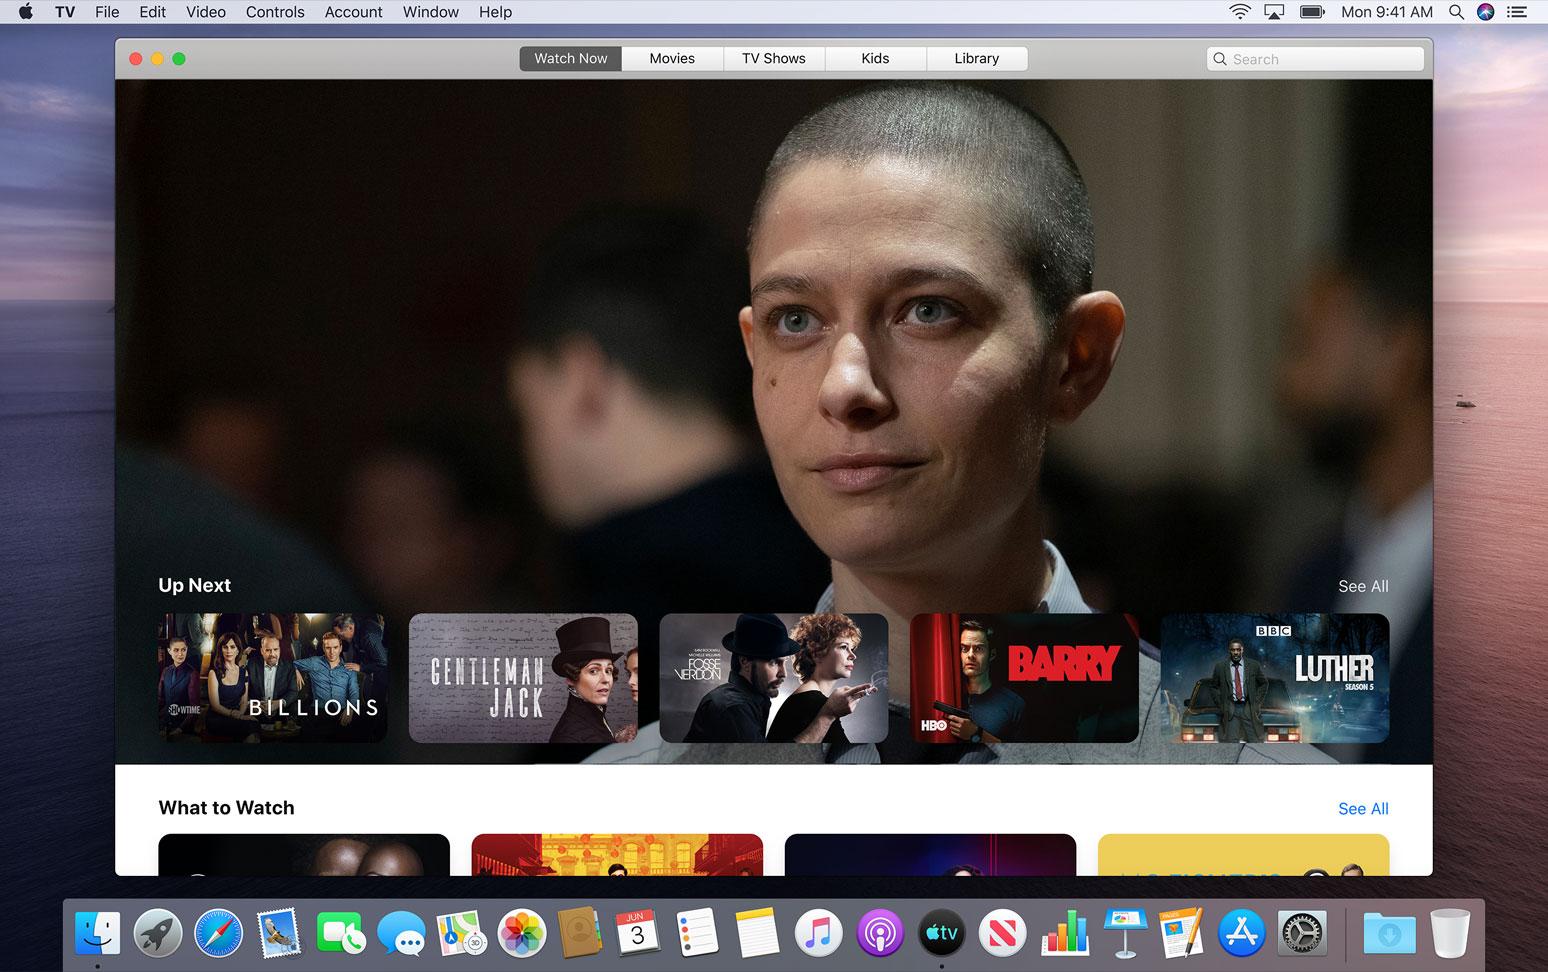 Apple TV app for macOS Catalina